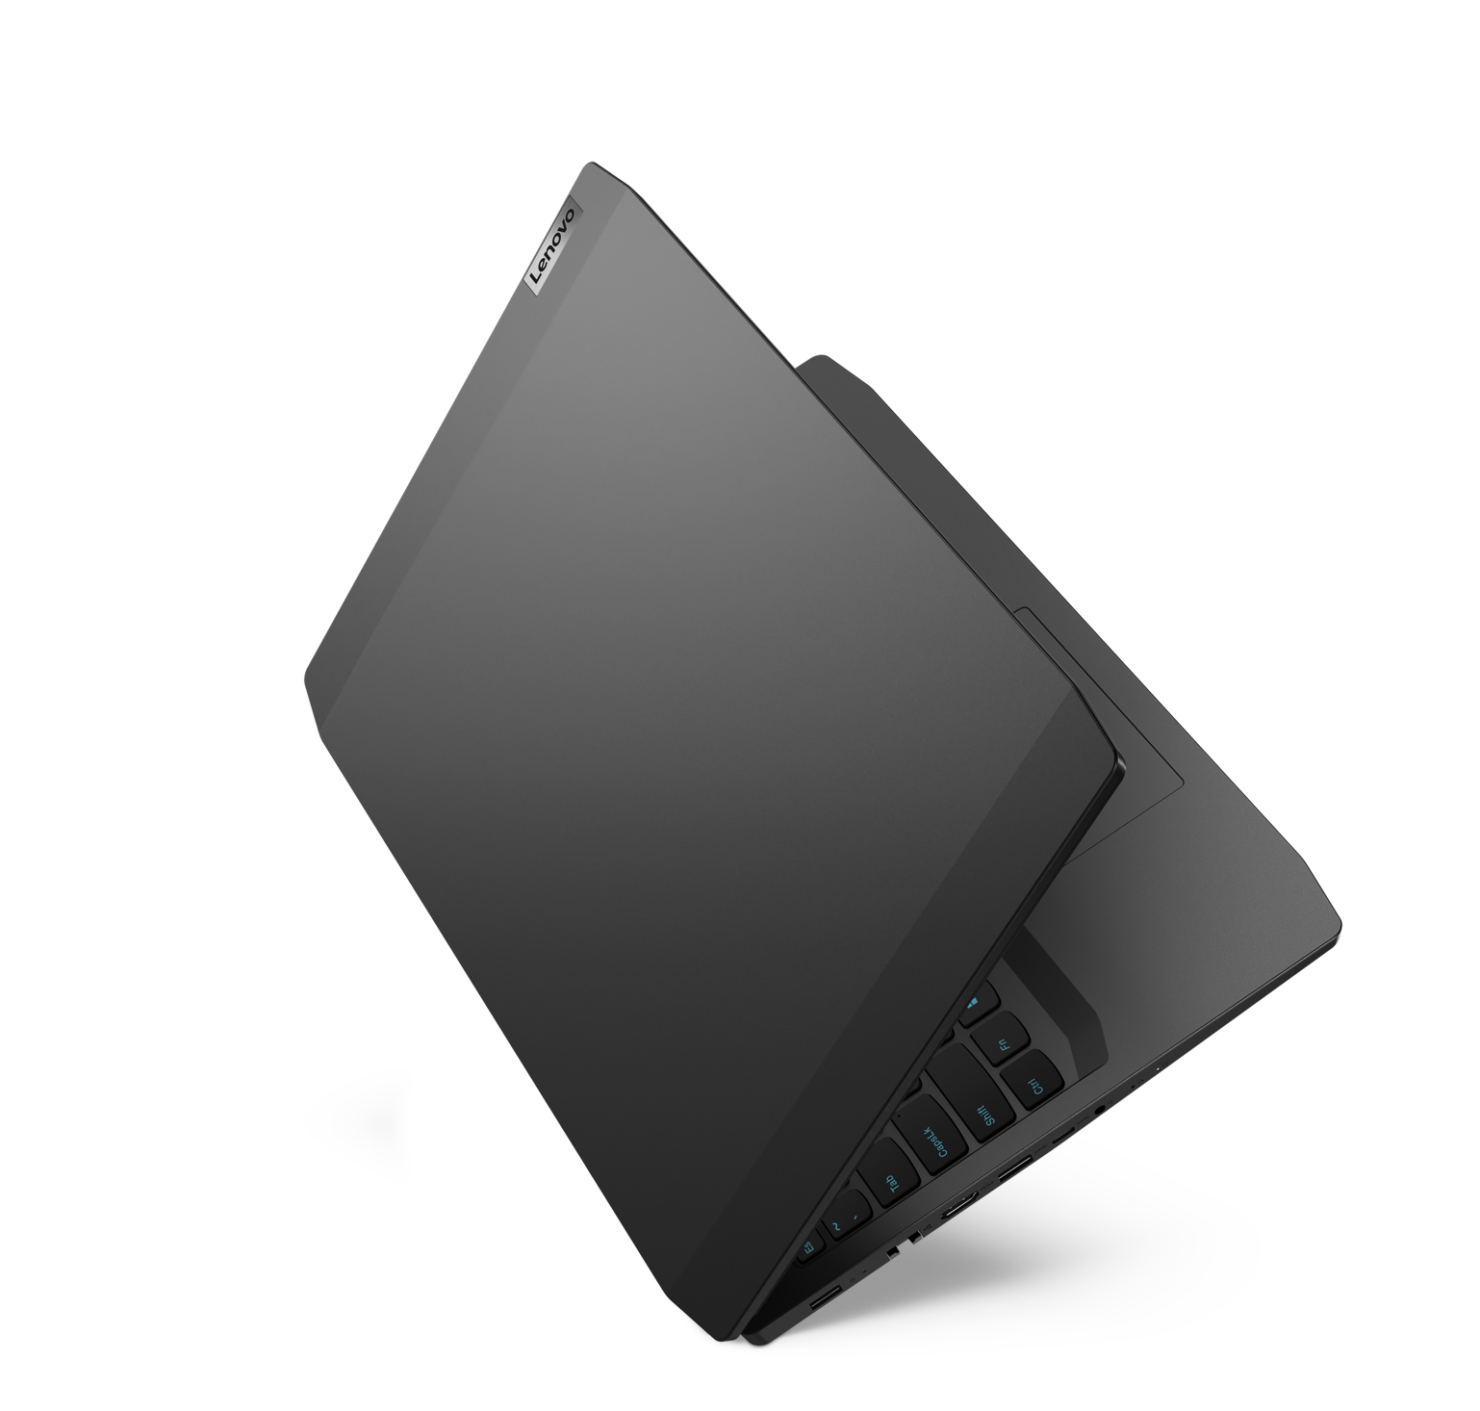 lenovo-ideapad-gaming-3_15inch_cover_black